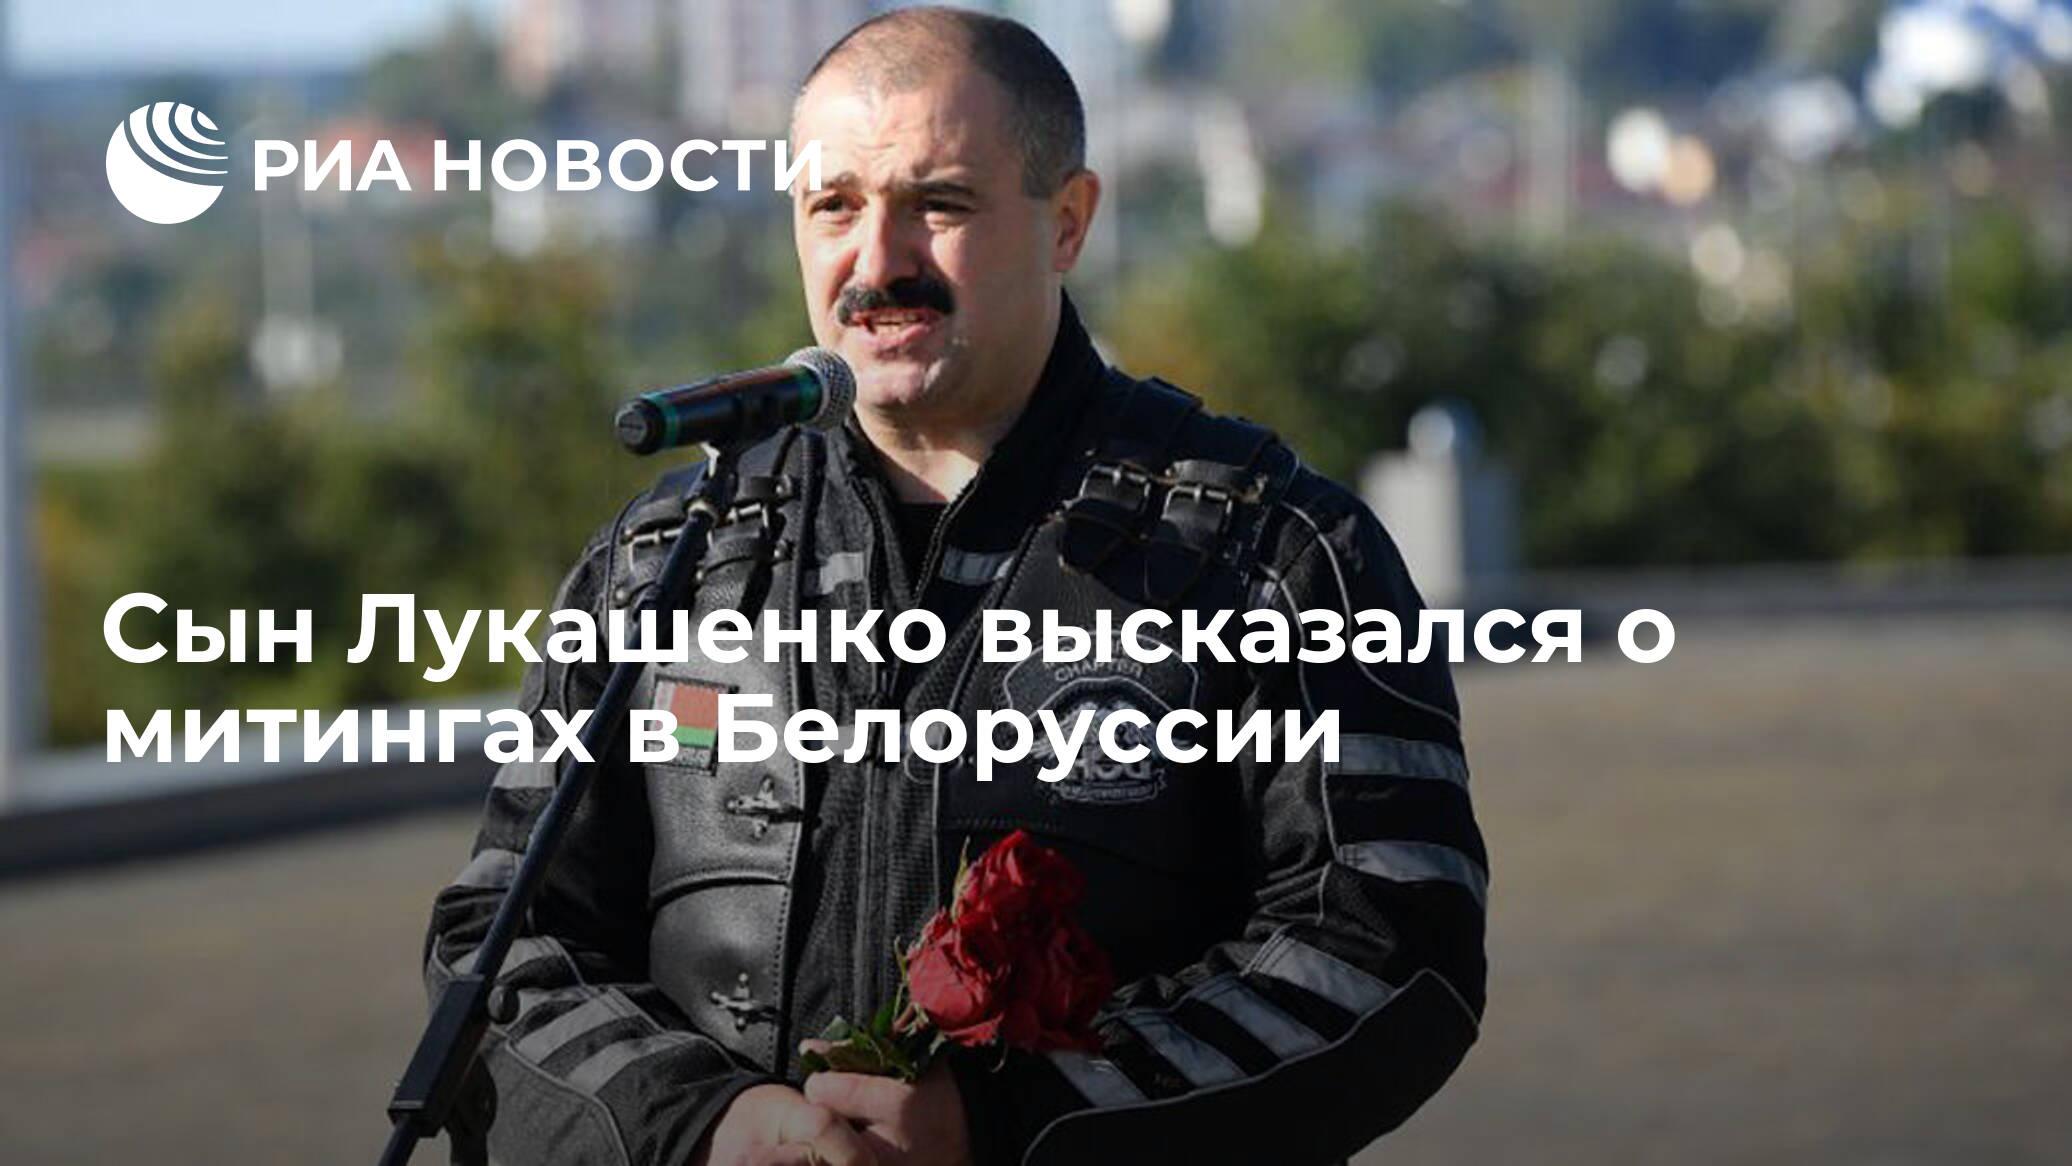 Новости РЕН ТВ — Википедия